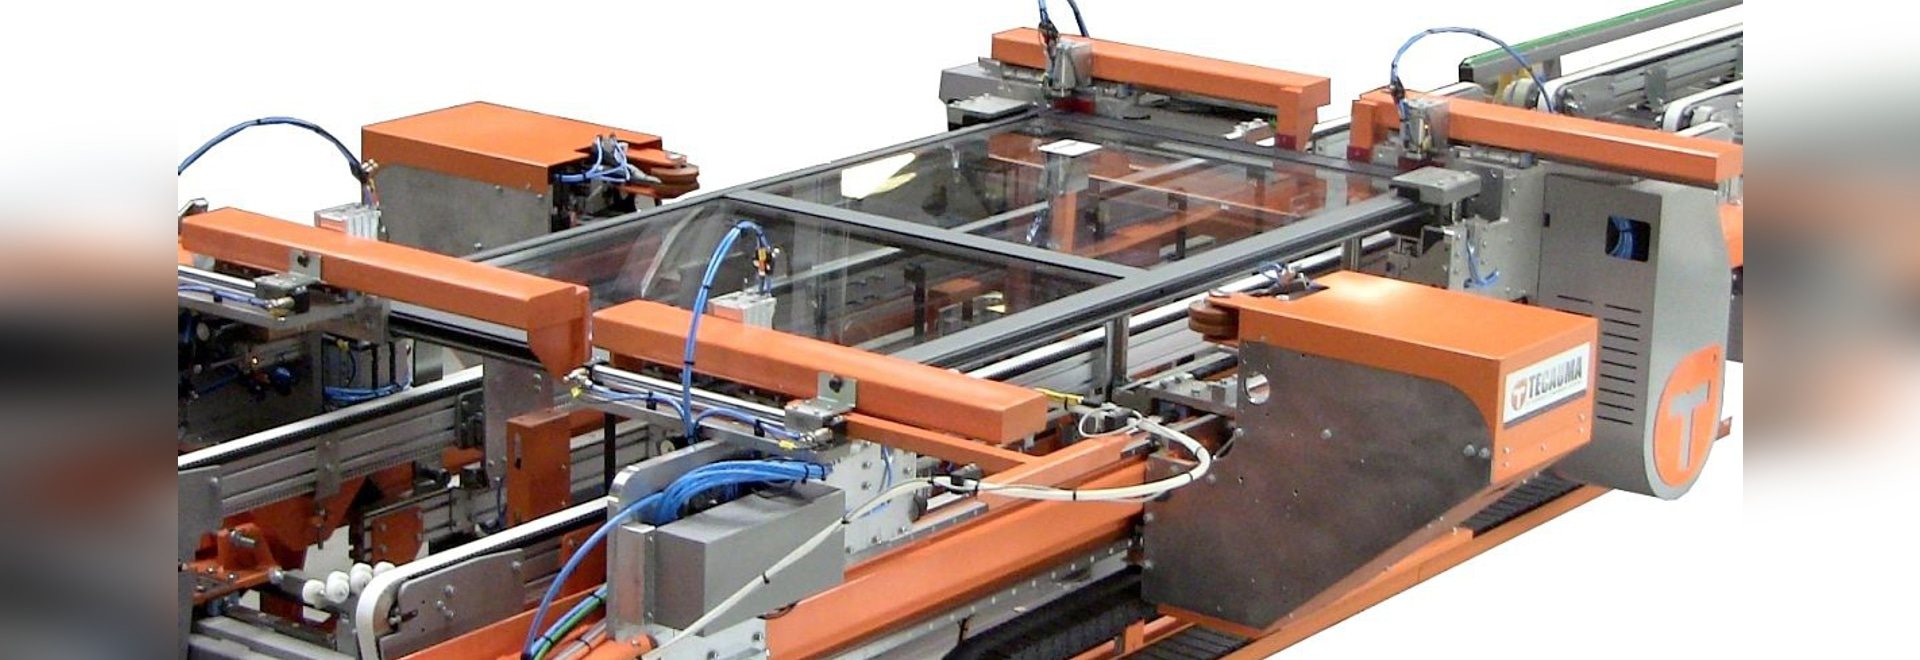 Máquina que enmarca automatizada para los marcos de ventana - TECAUMA